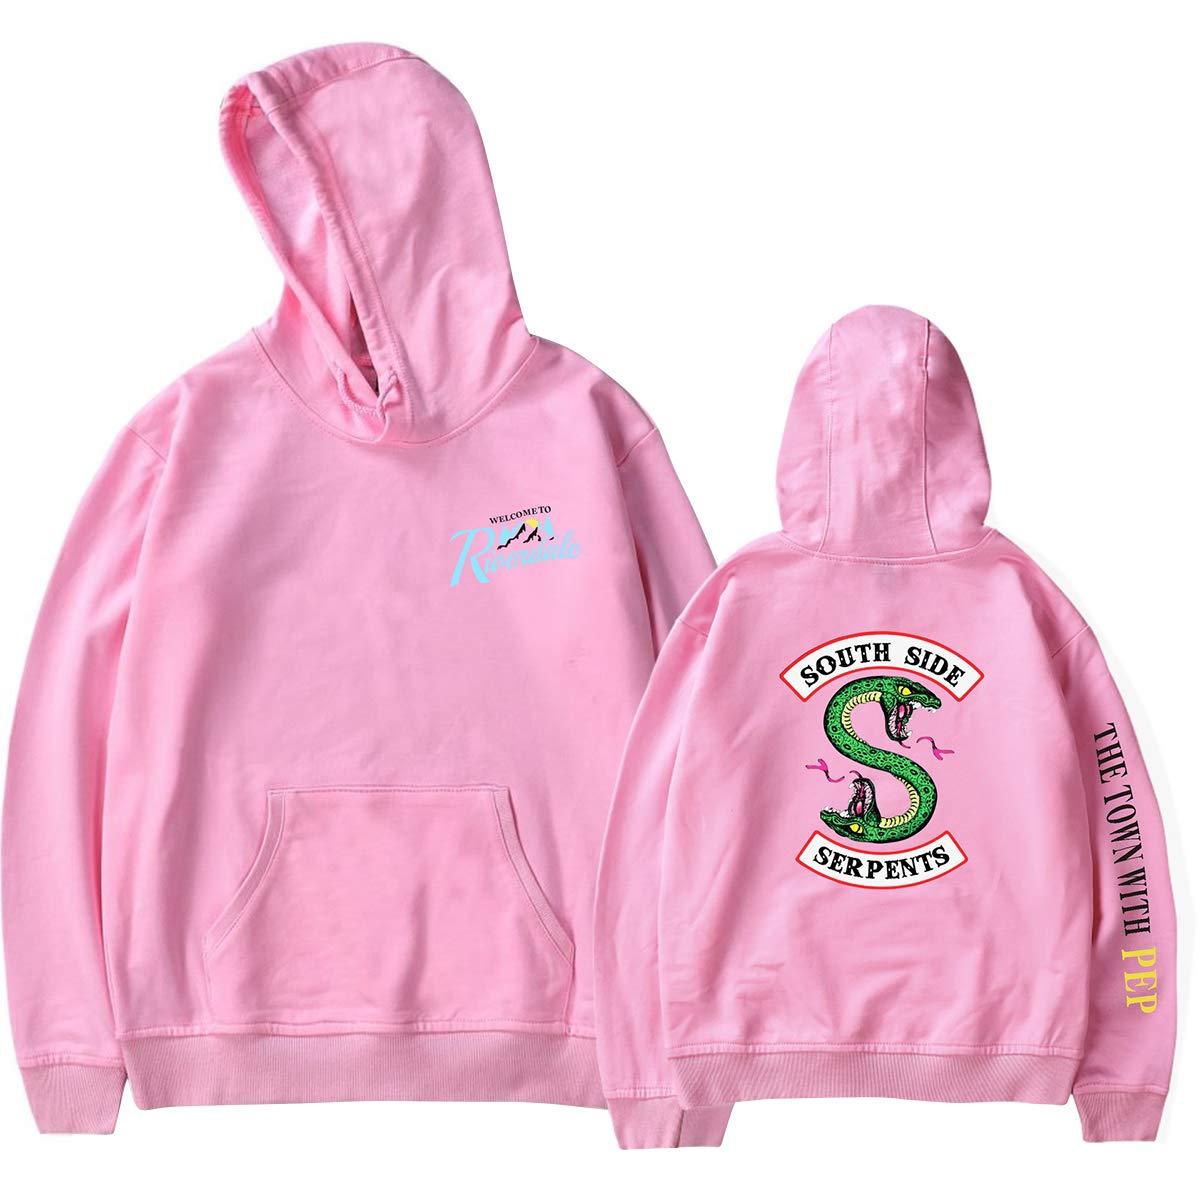 ZMLIA Riverdale Southside Serpents Unisex Hoodies Hooded Sweatshirt Fleece Pullover